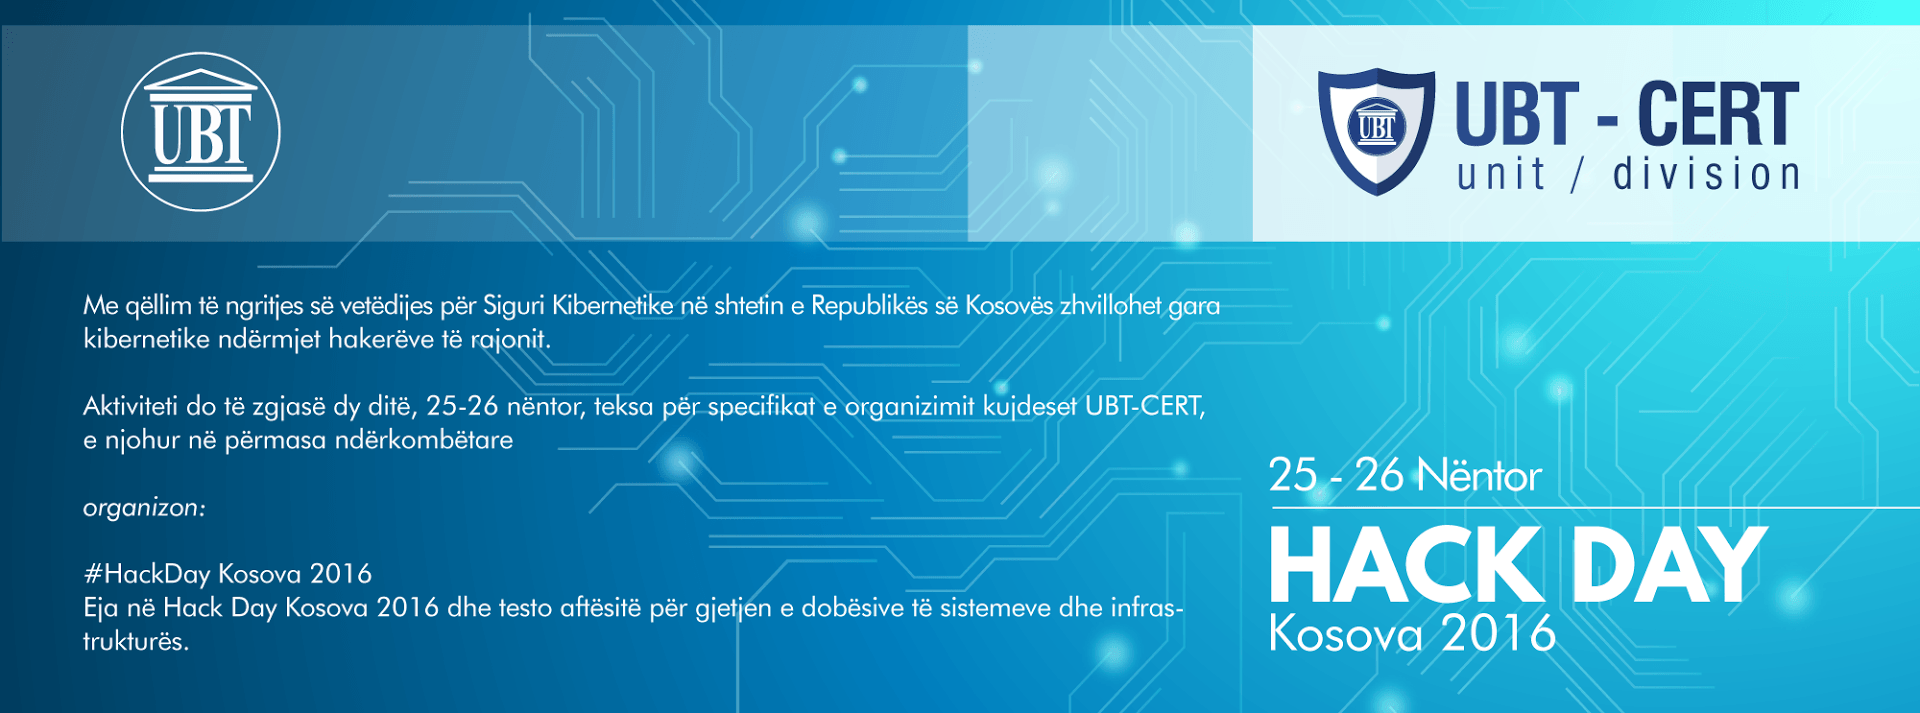 "UBT-CERT organizon aktivitetin ""HackDay Kosova 2016"""